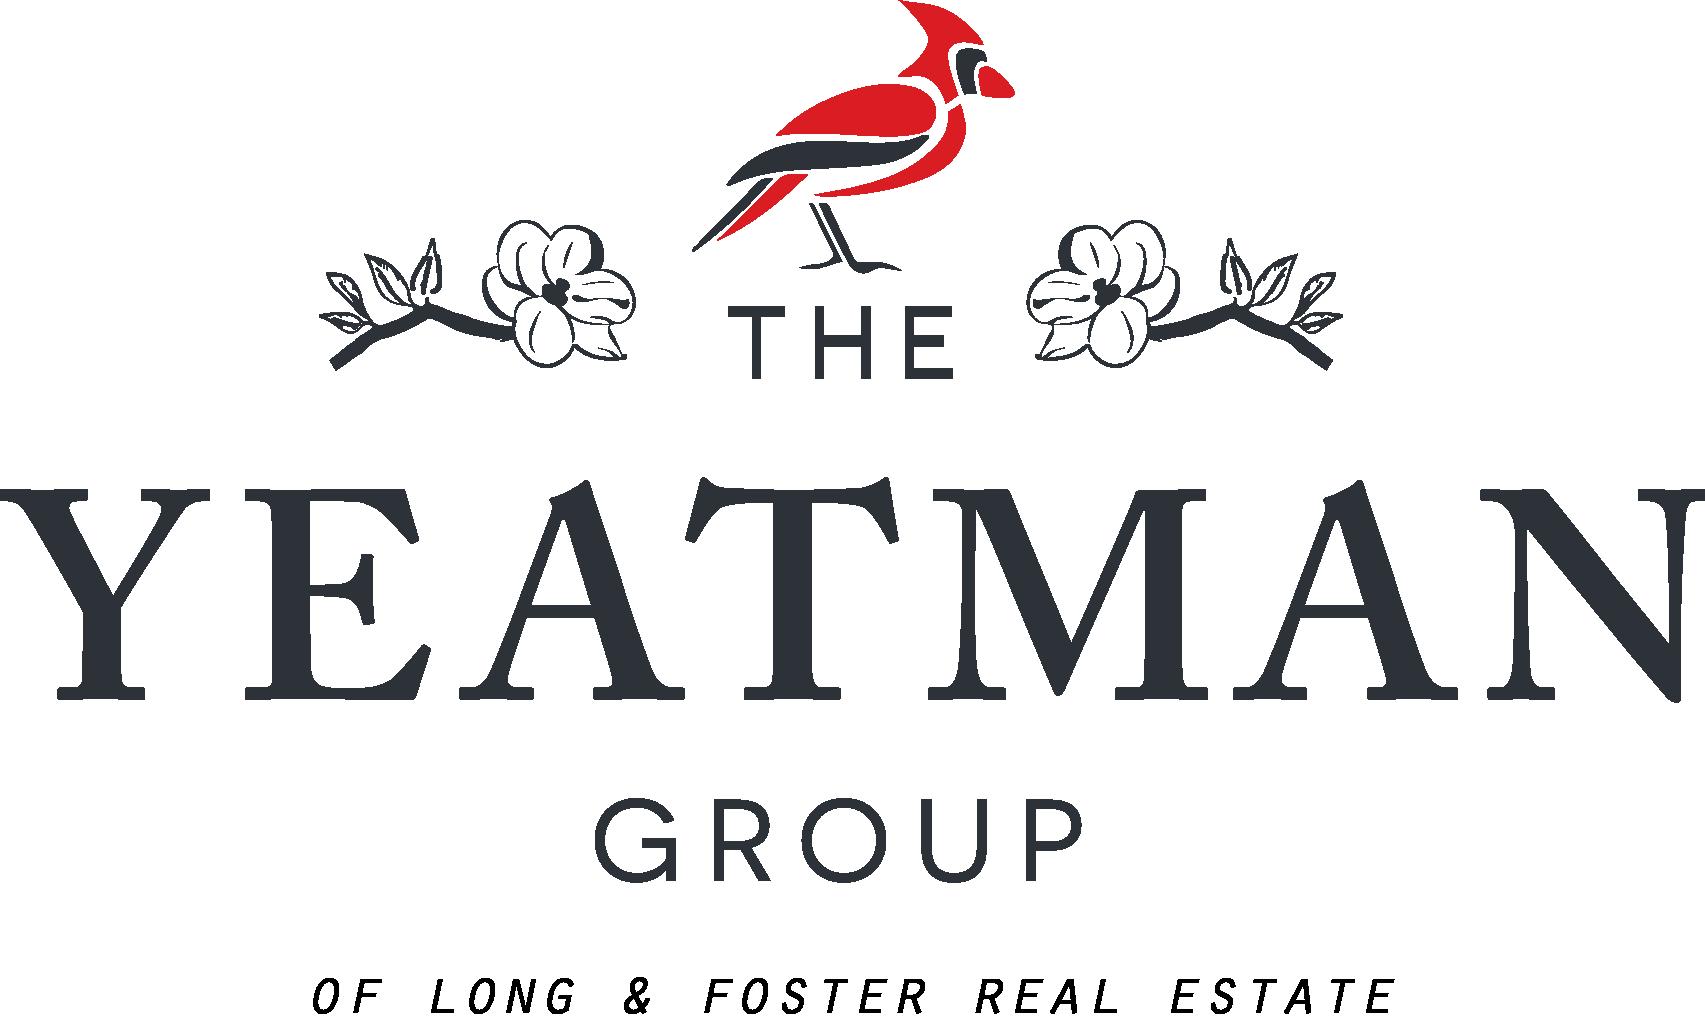 The Yeatman Group logo